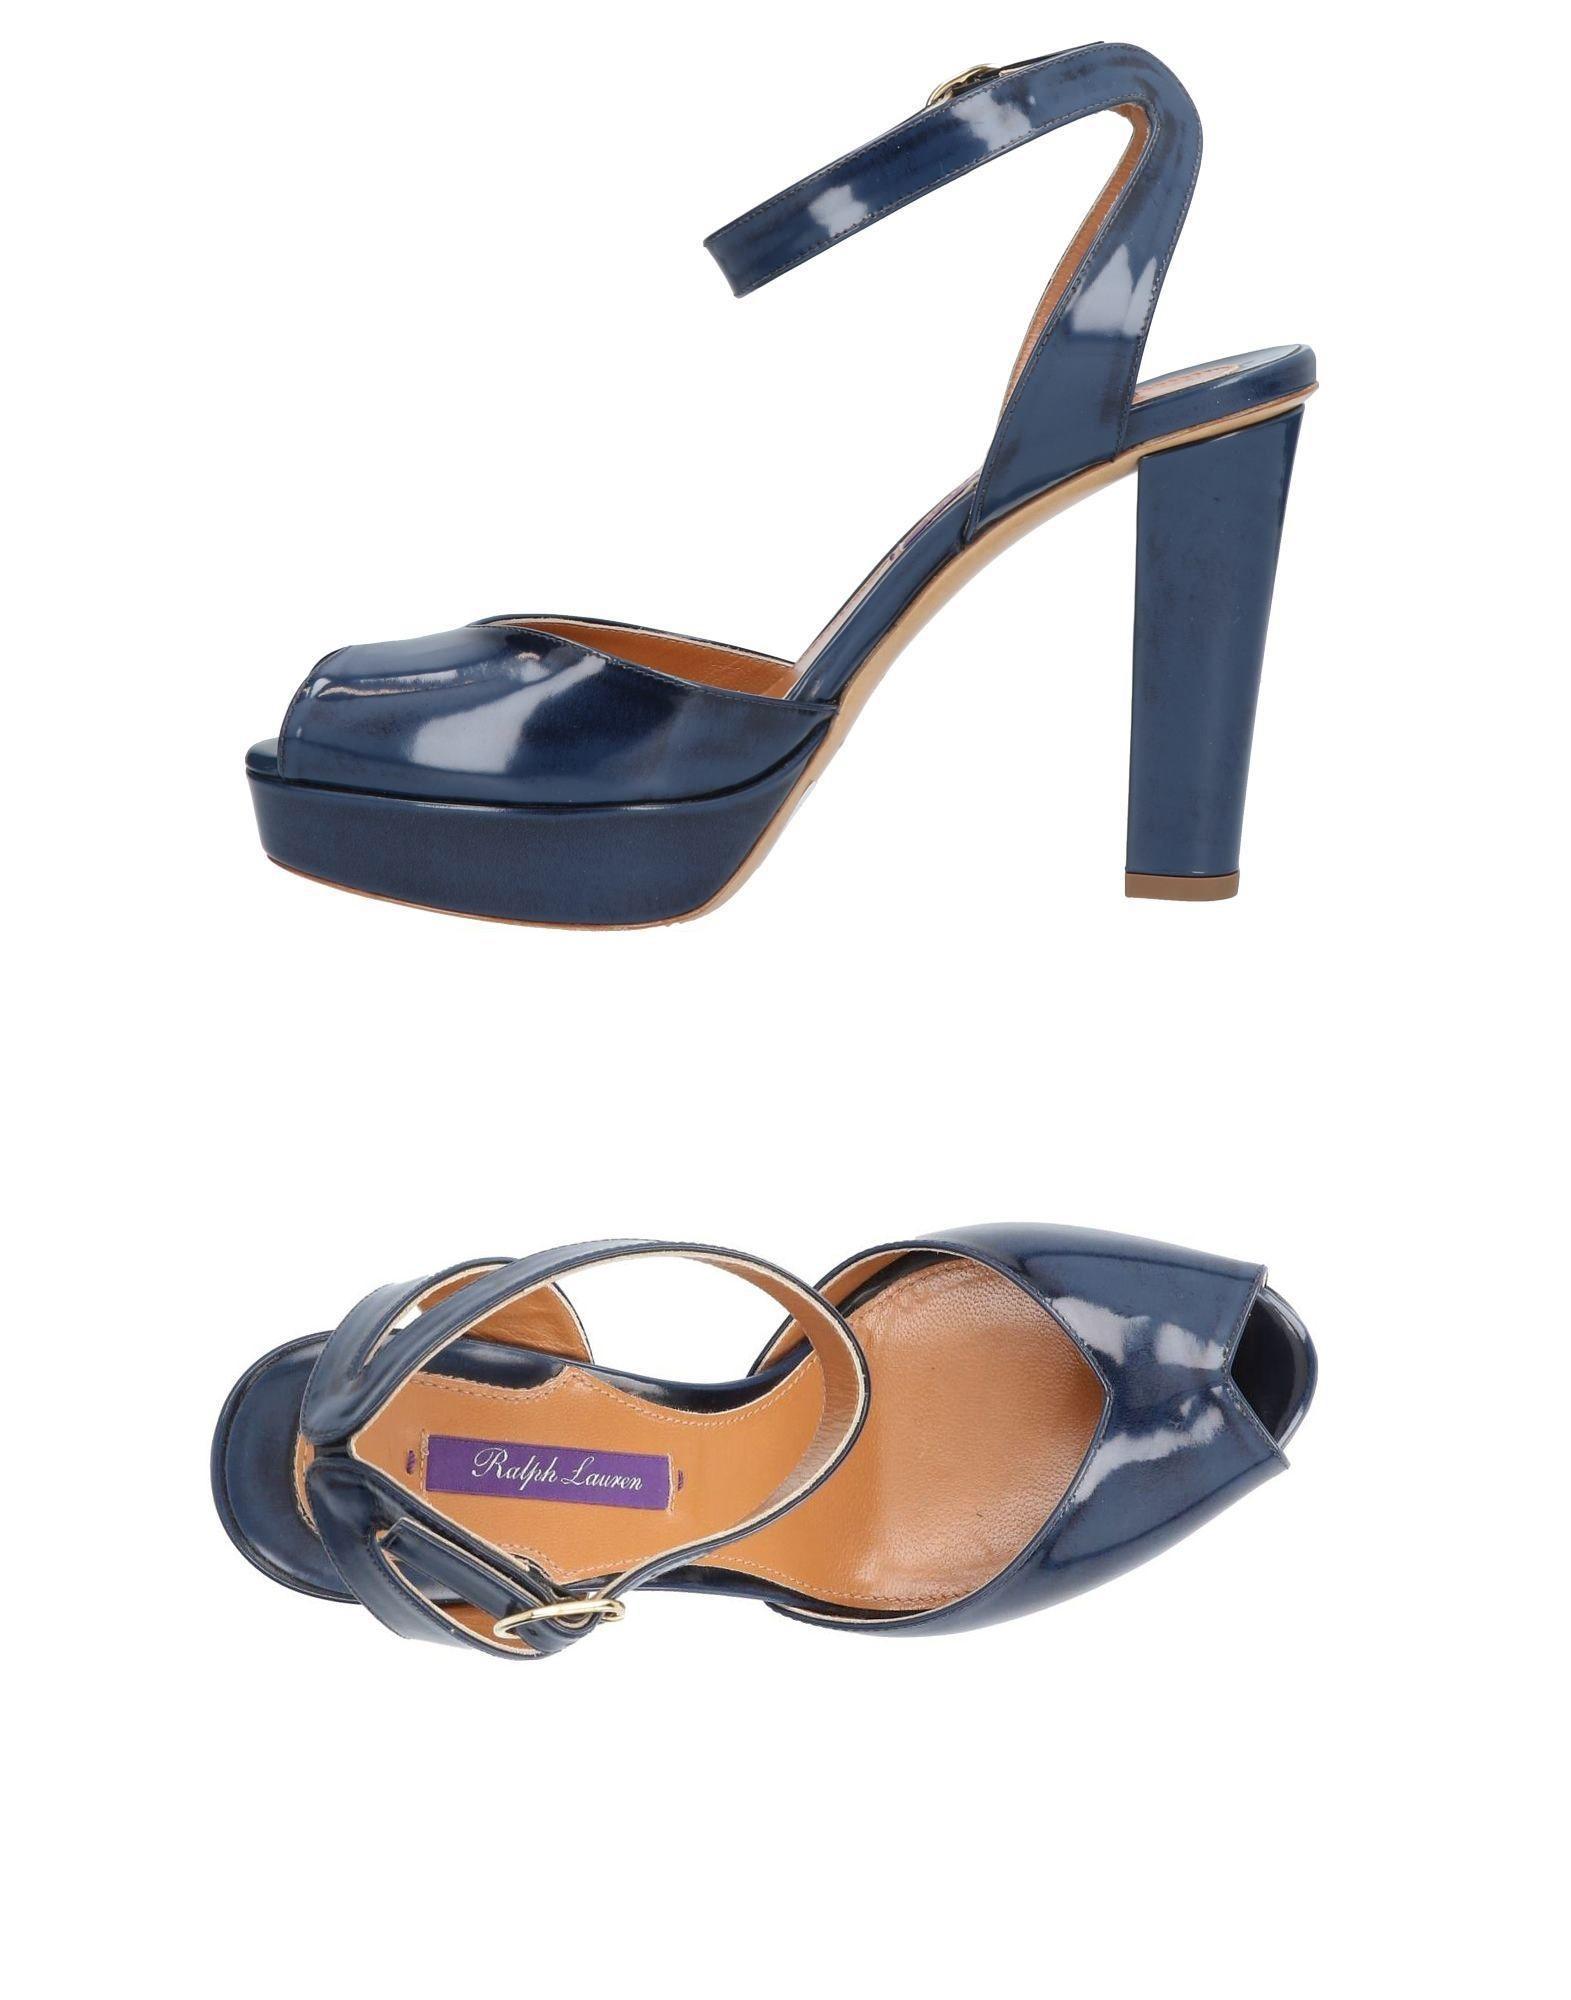 Ralph Lauren Sandals In Dark Blue